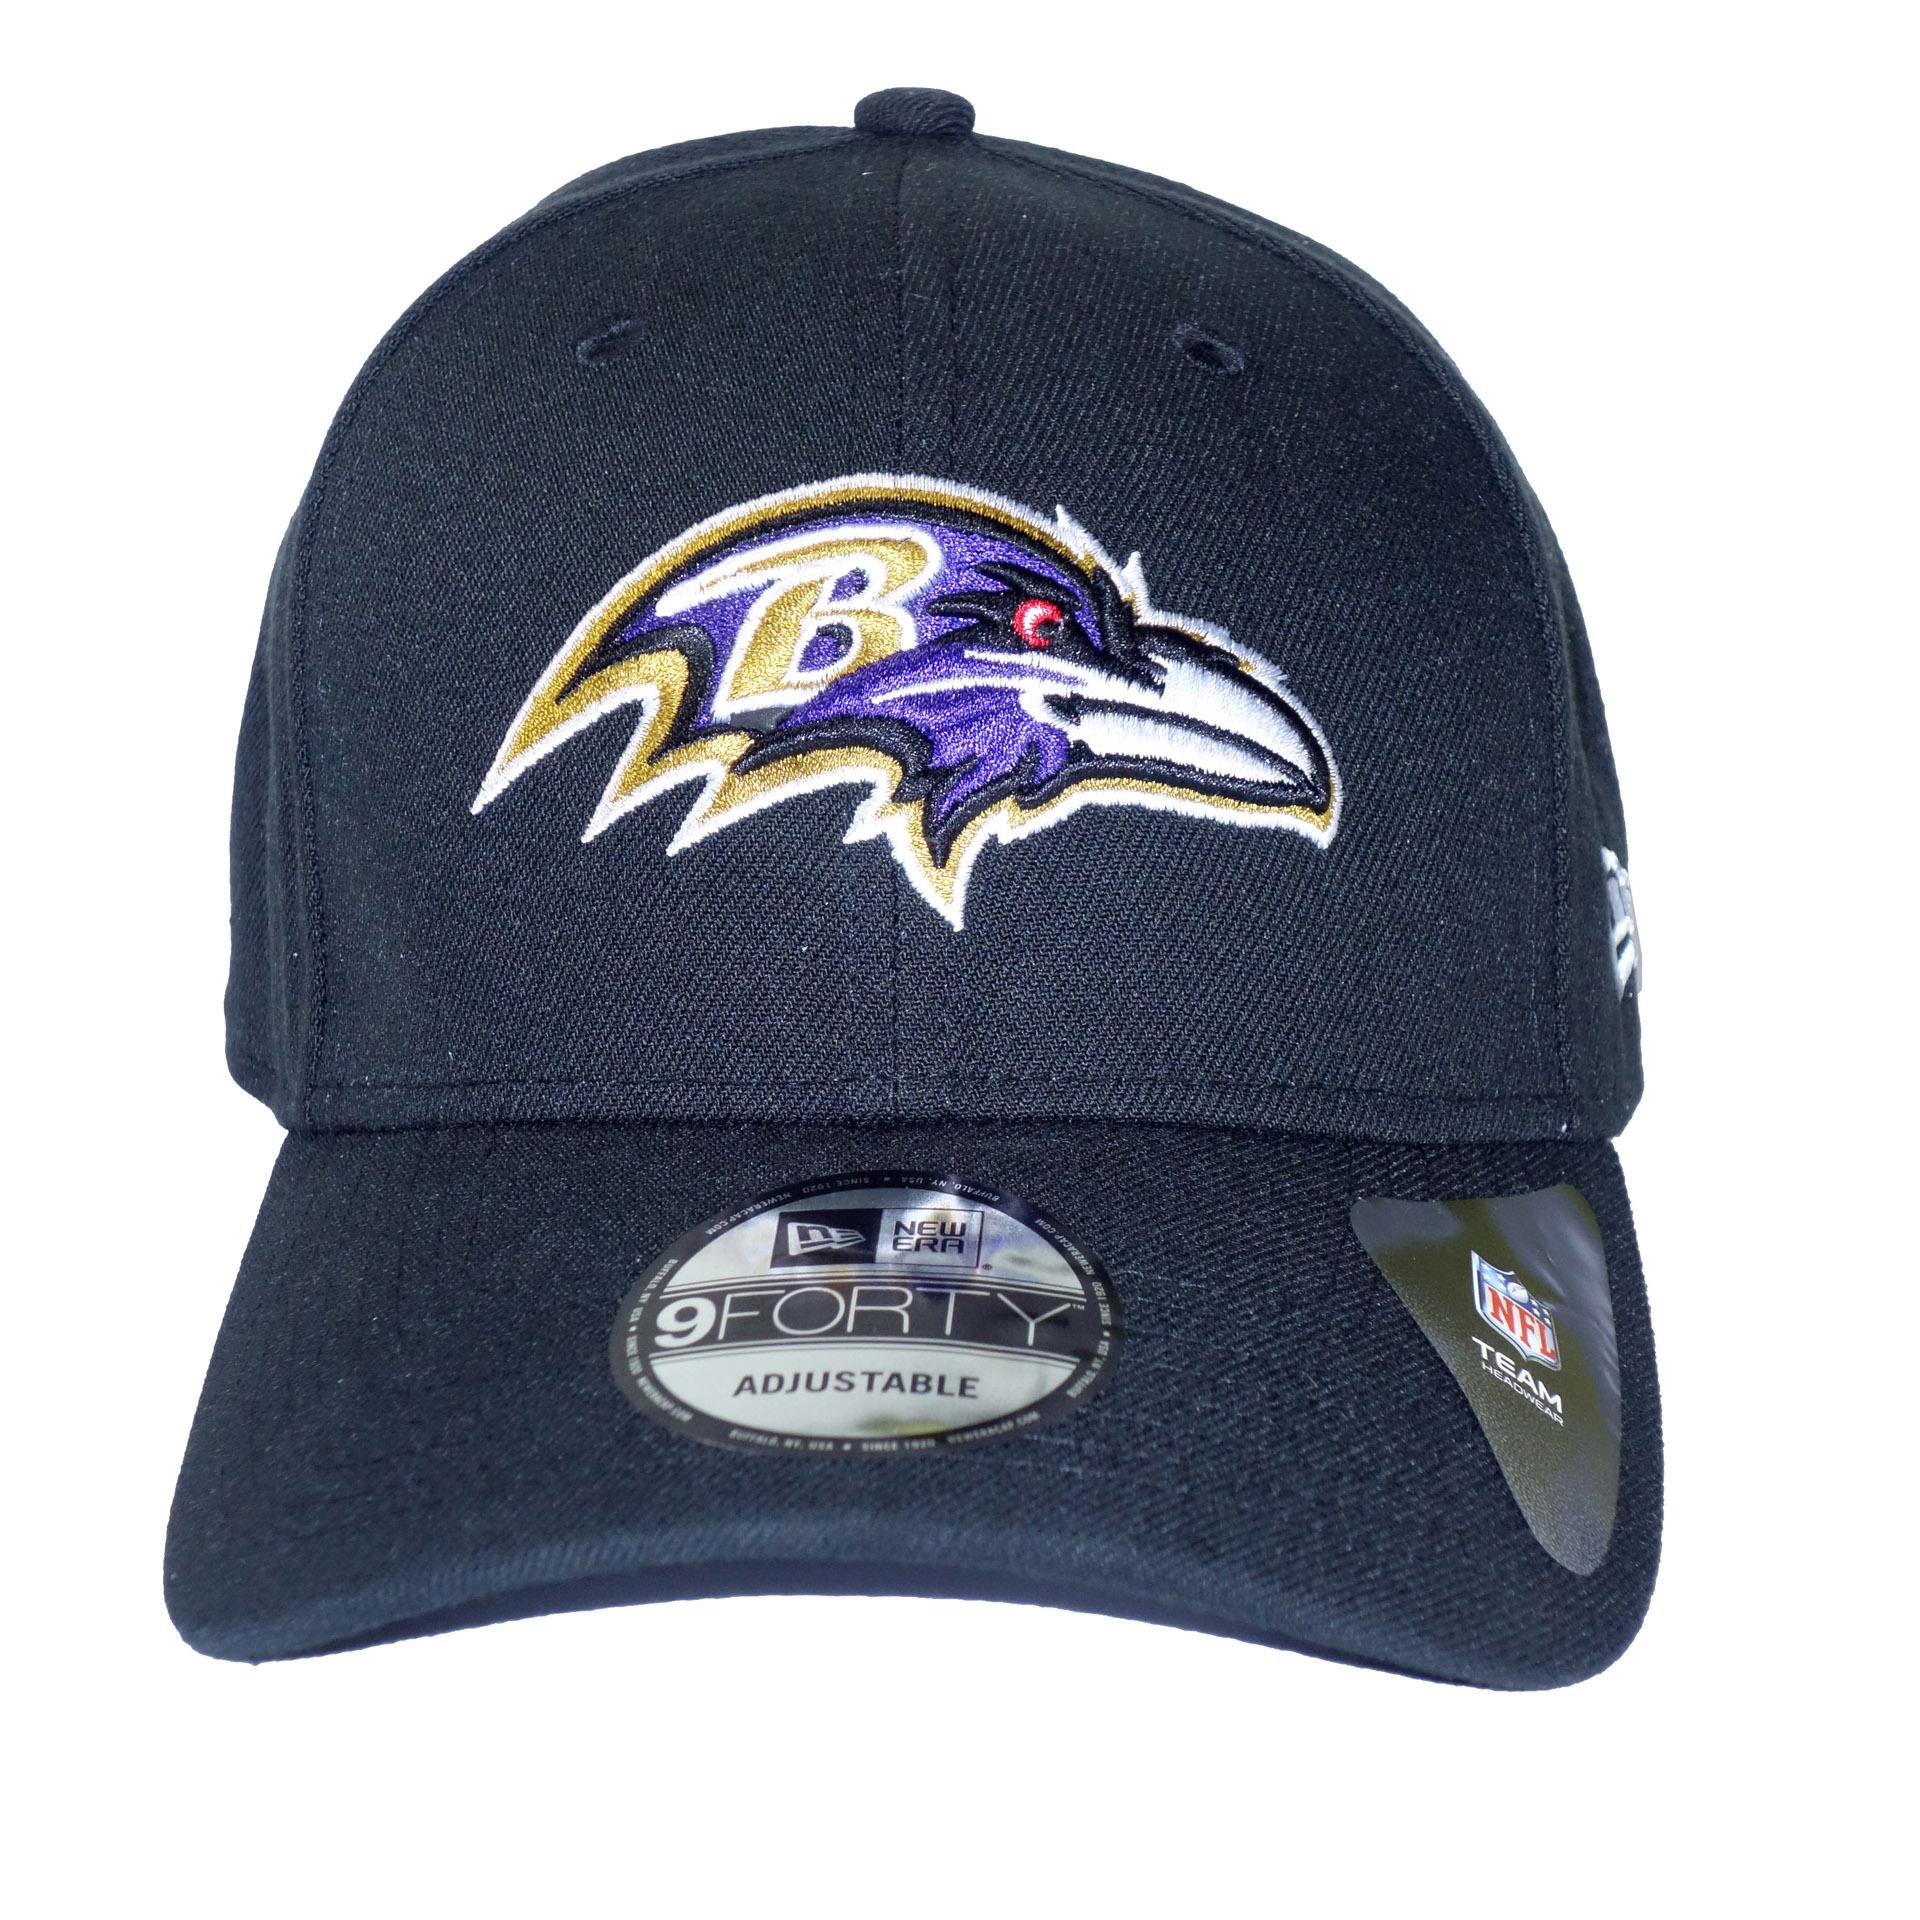 NFL New Era Cap Baltimore Ravens